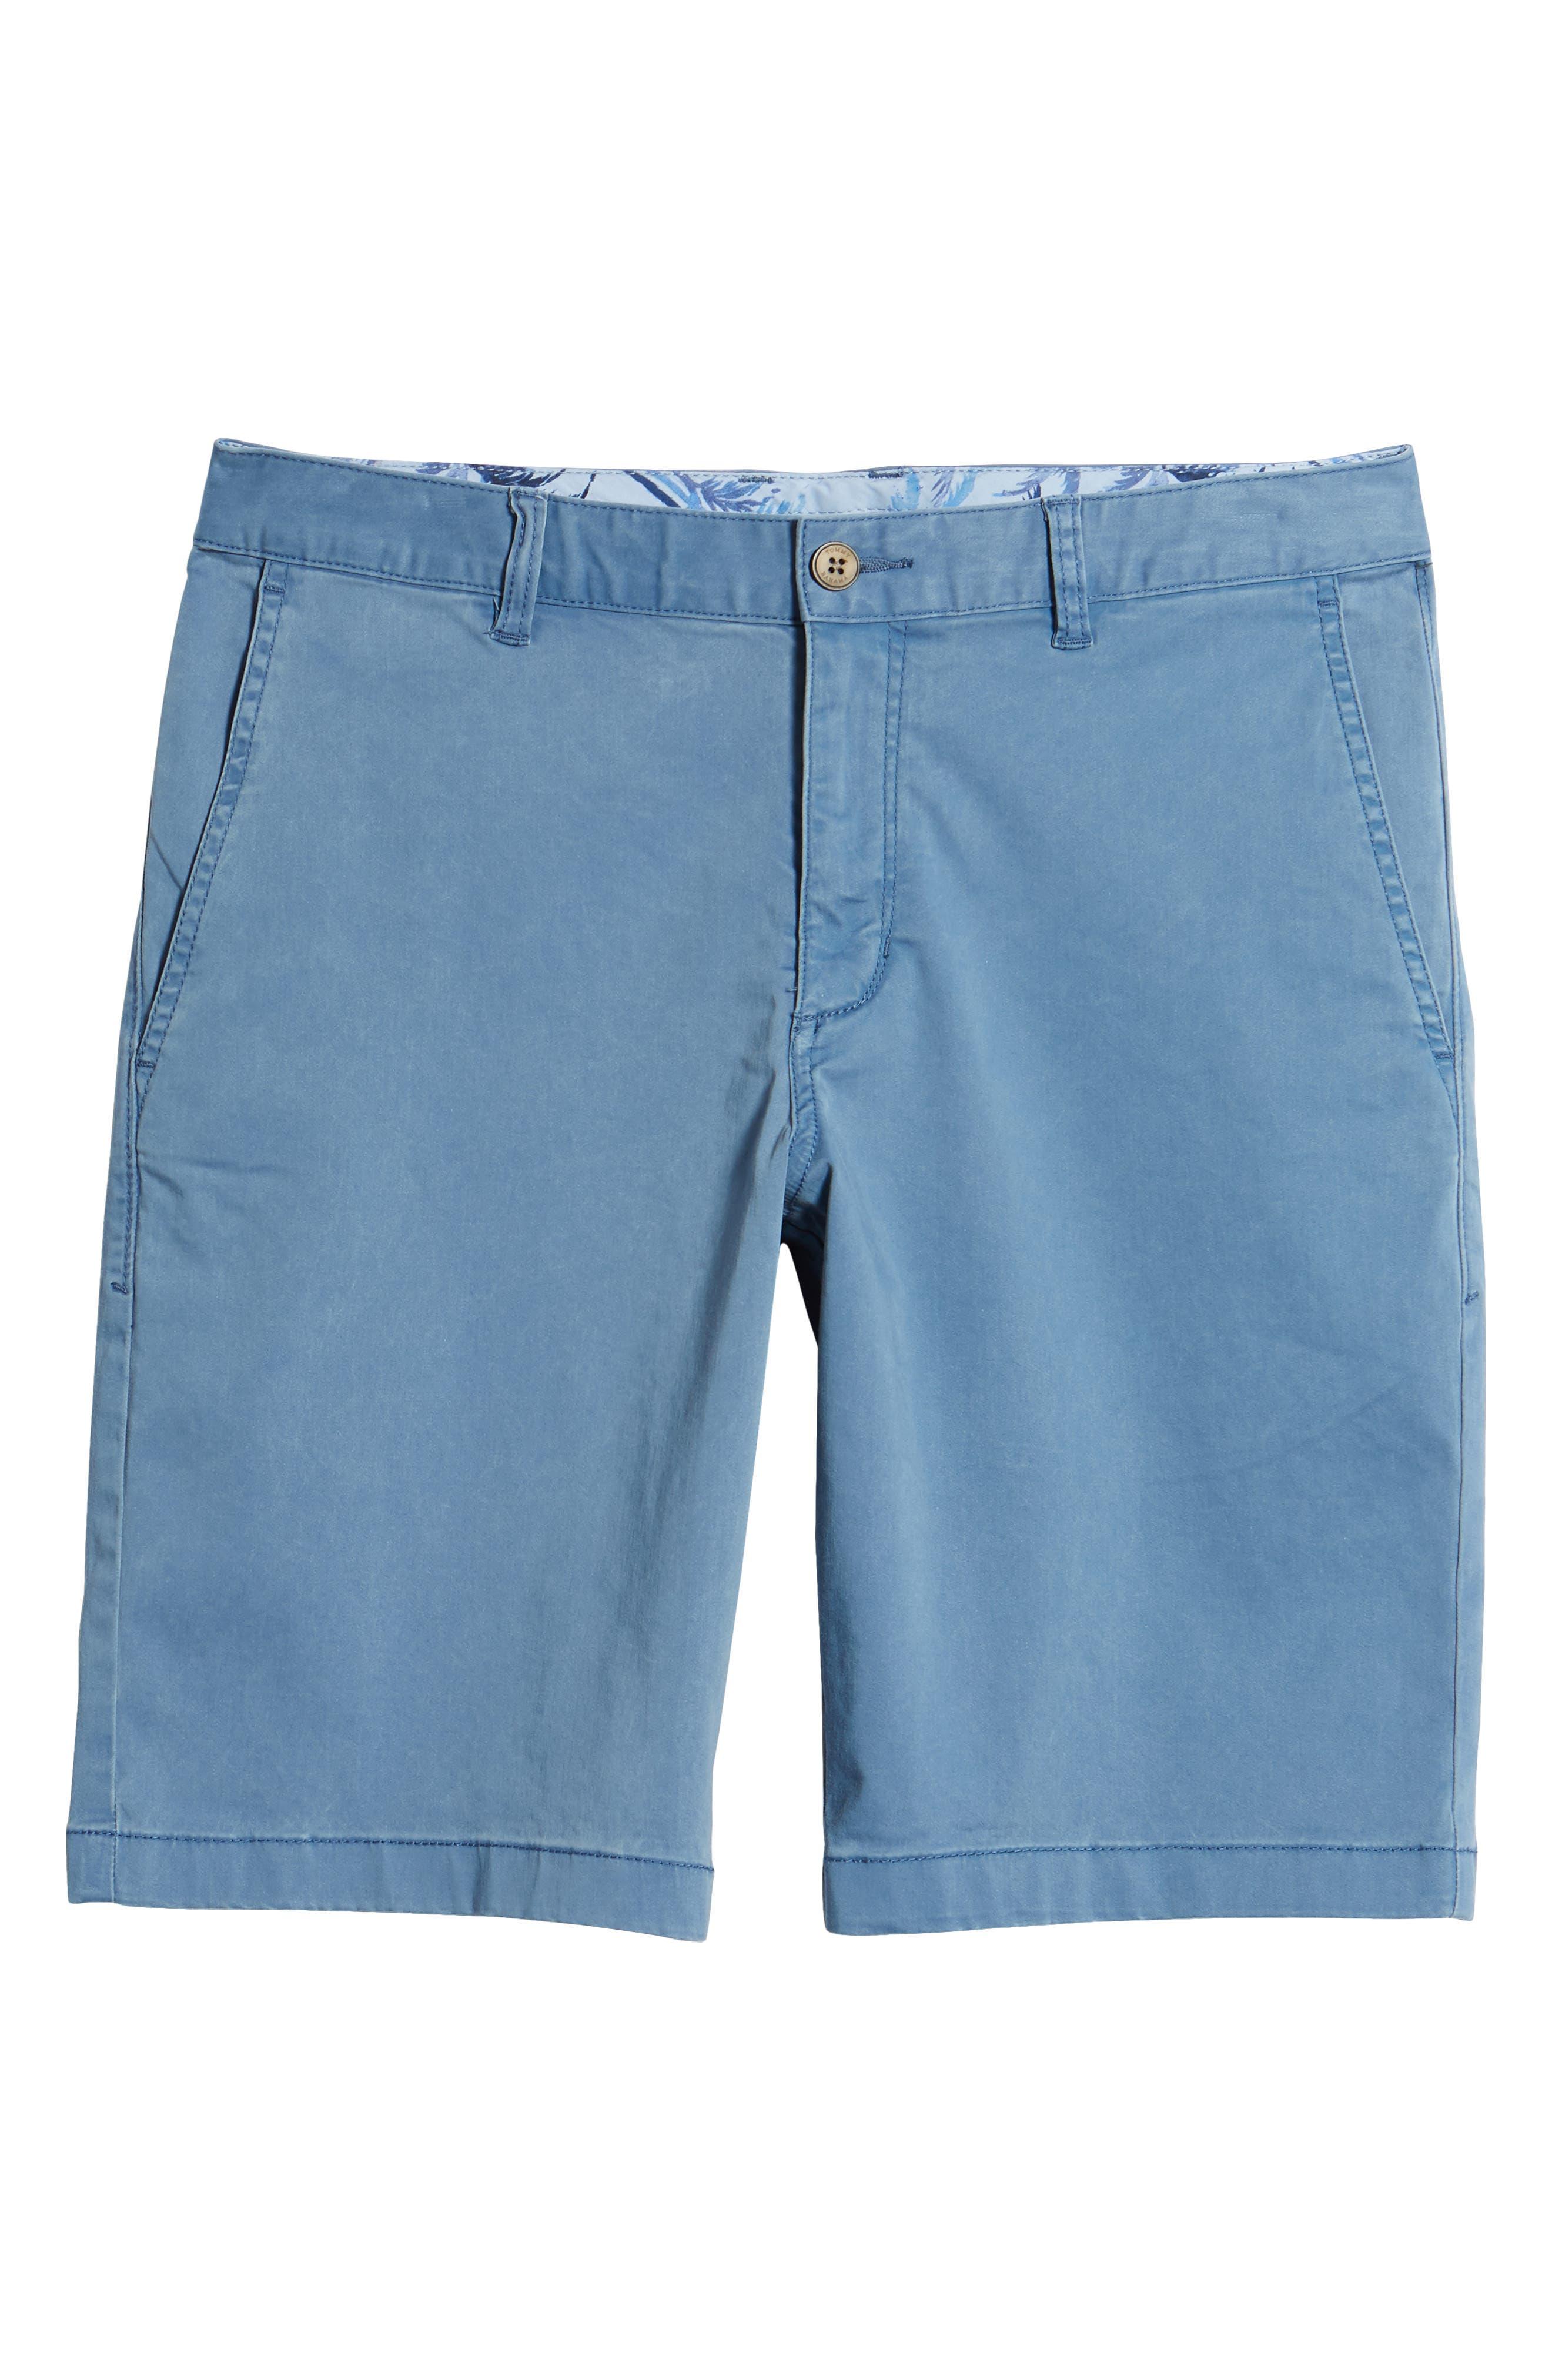 Boracay Chino Shorts,                             Alternate thumbnail 45, color,